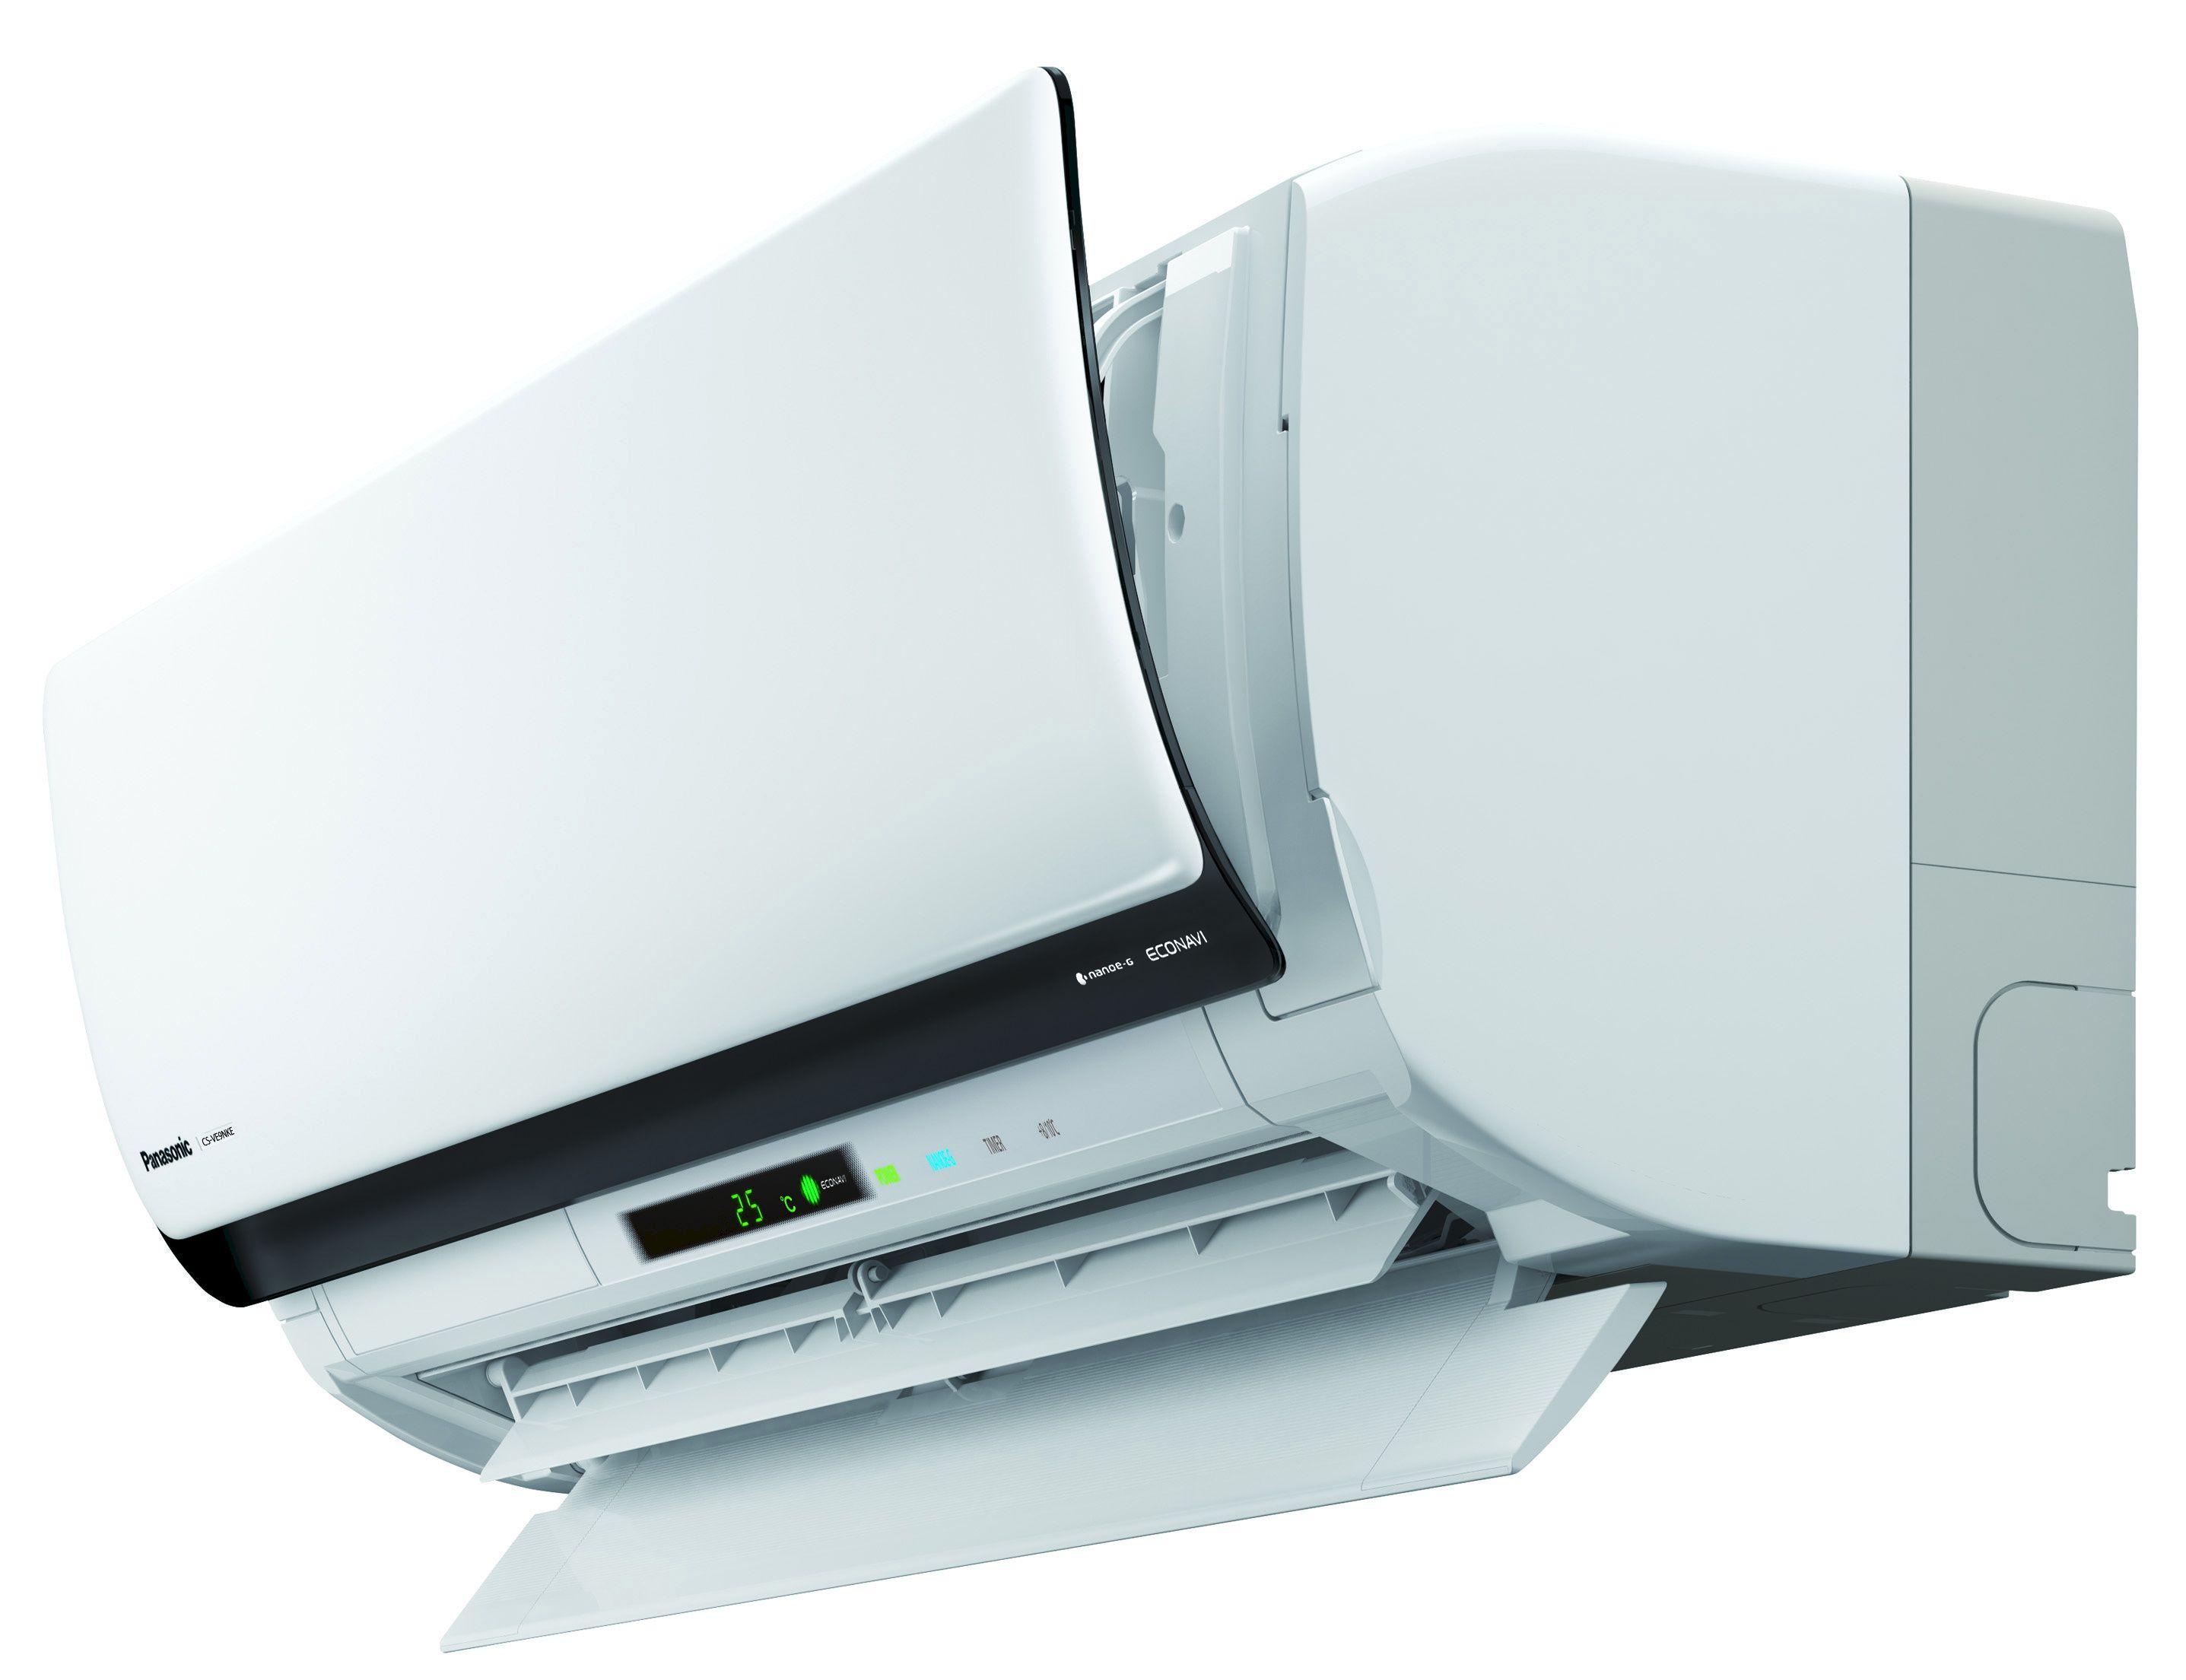 Slik ser Panasonics nye smart-varmepumpe ut. Foto: Panasonic / Verisure